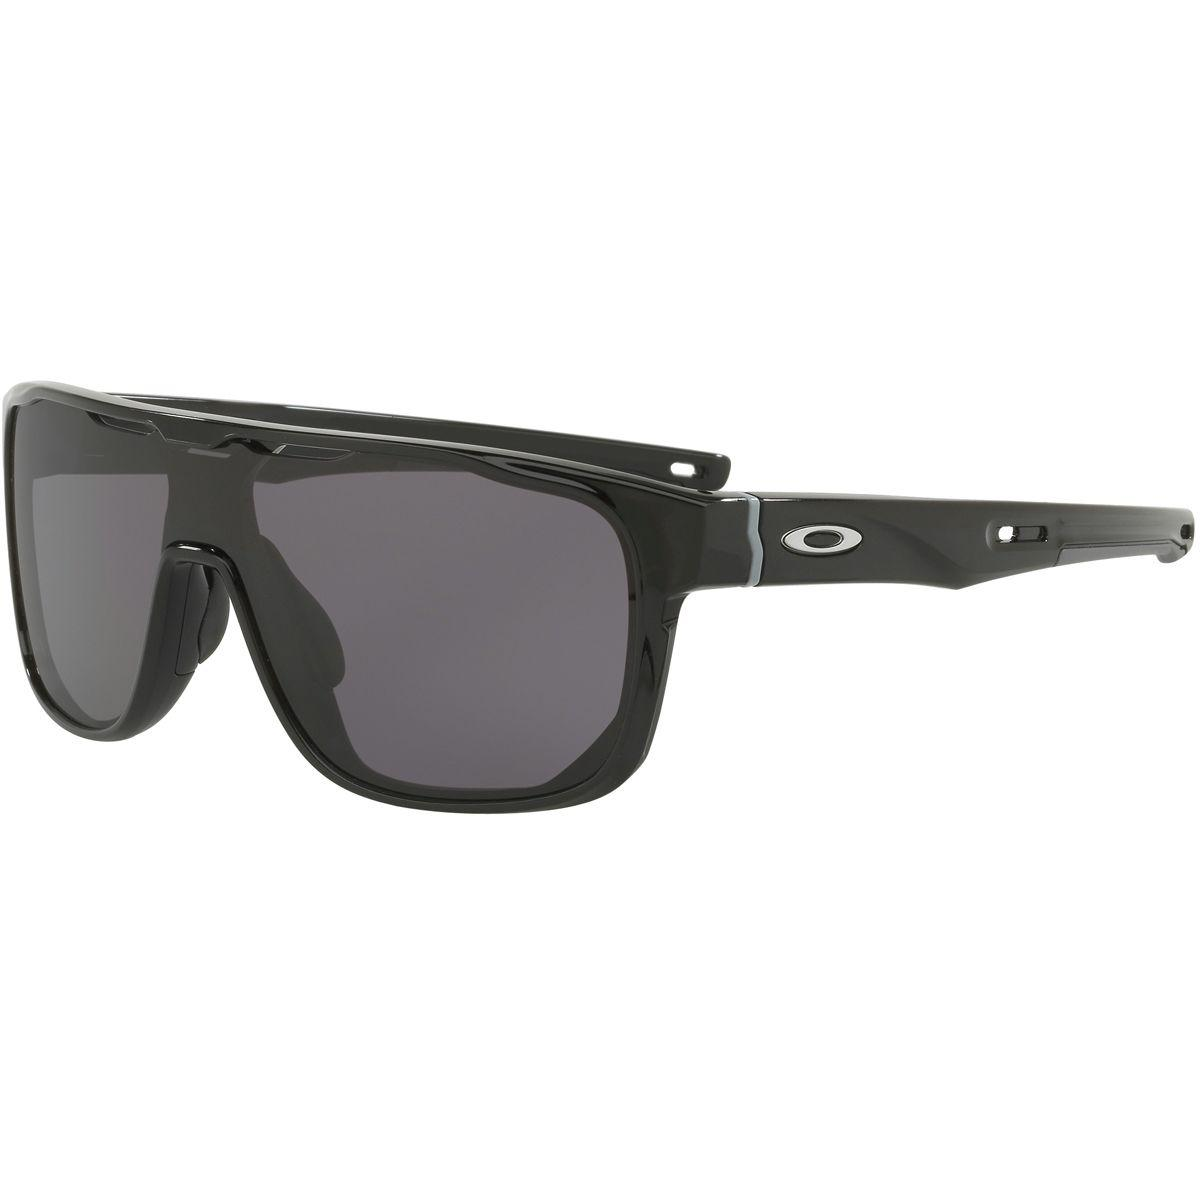 Oakley Crossrange Shield Black Polished Sonnenbrille Schwarz pTtEO